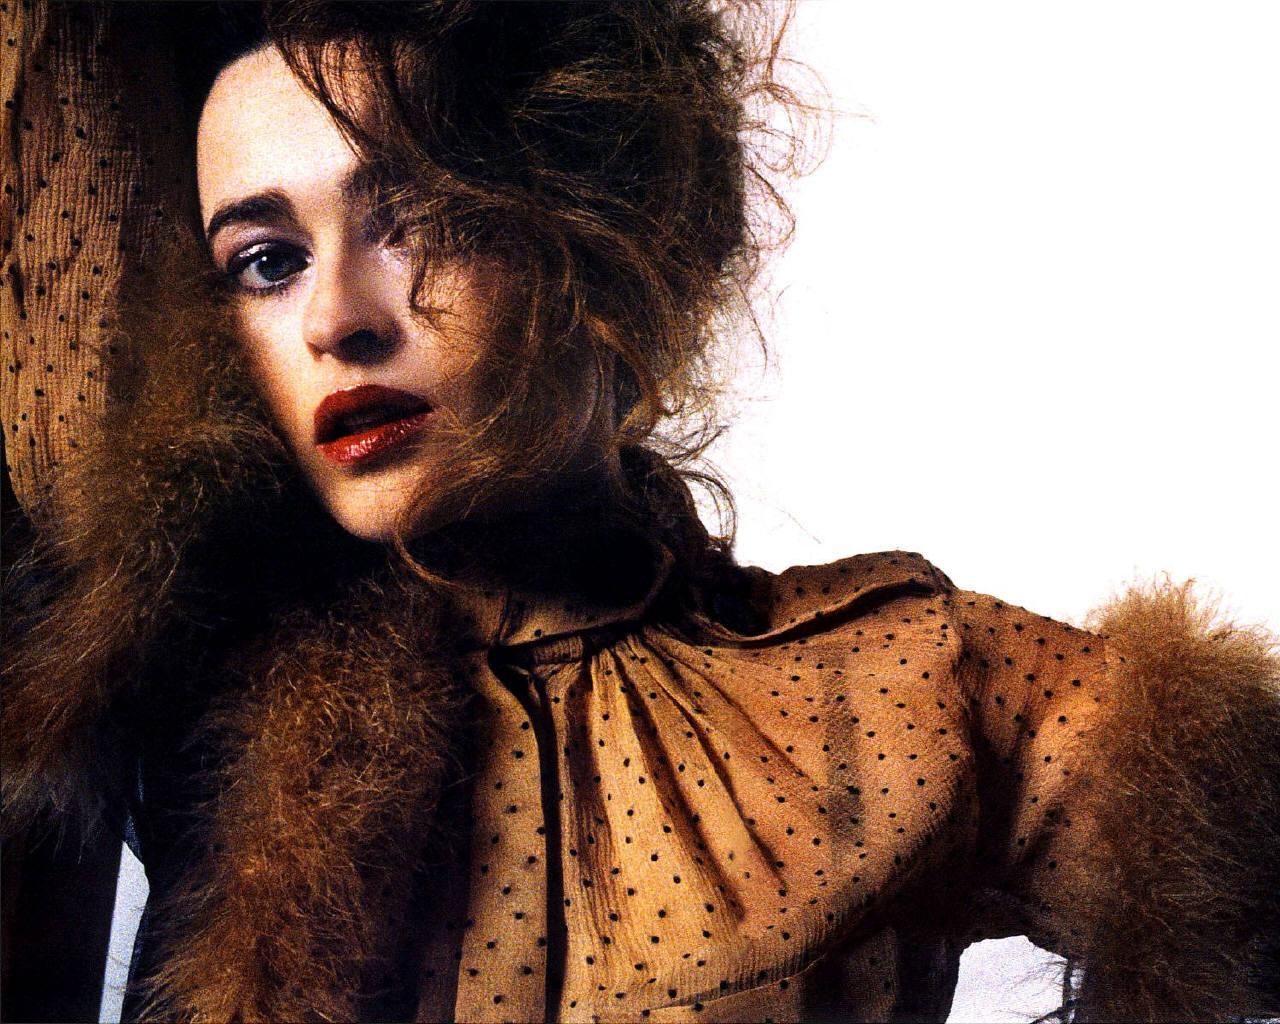 Helena-Bonham-Carter-helena-bonham-carter-129335_1280_1024.jpg Helena Bonham Carter